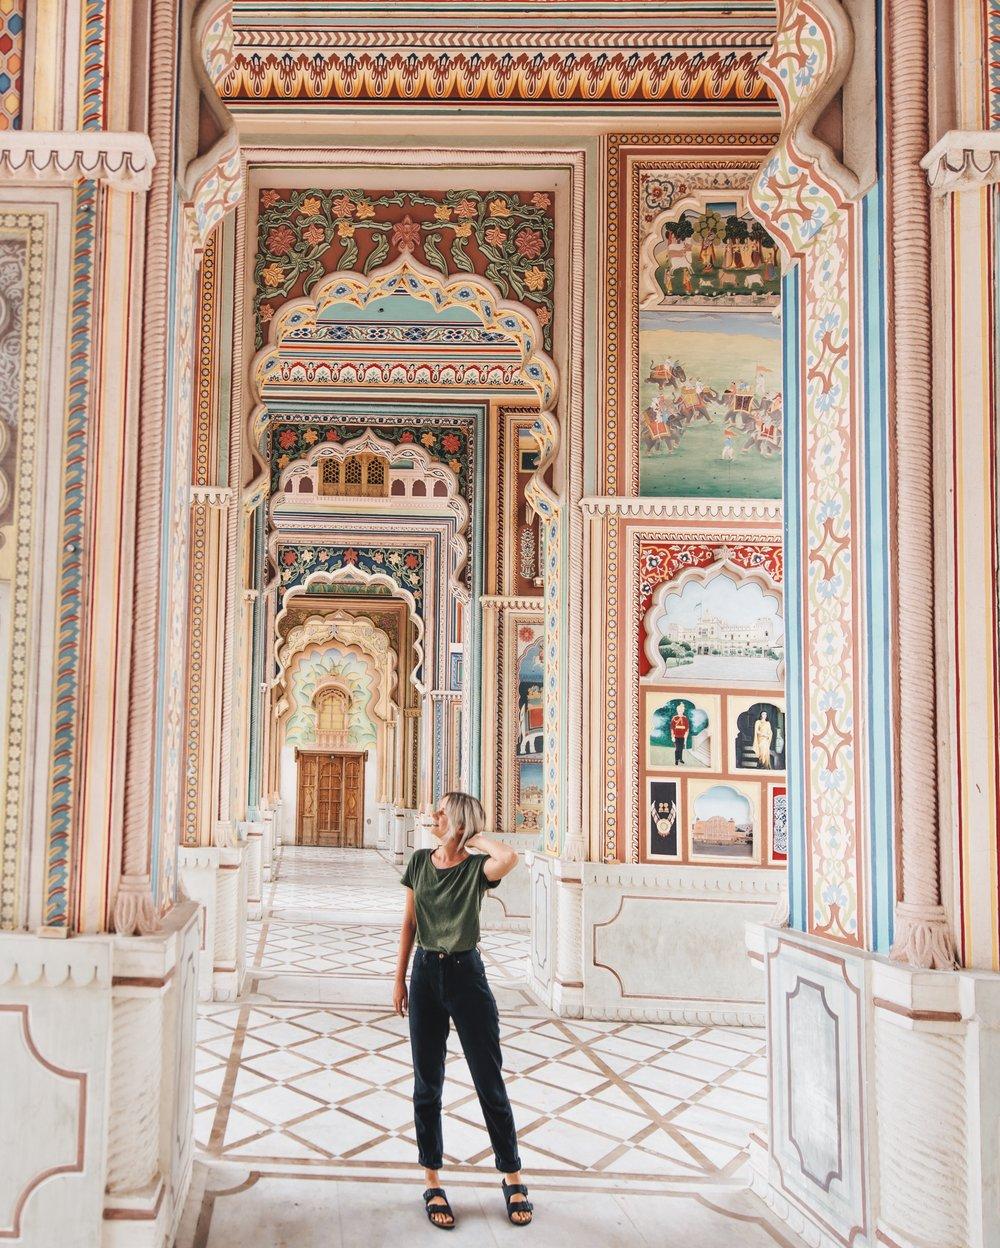 Jawarhar Circle - Jaipur